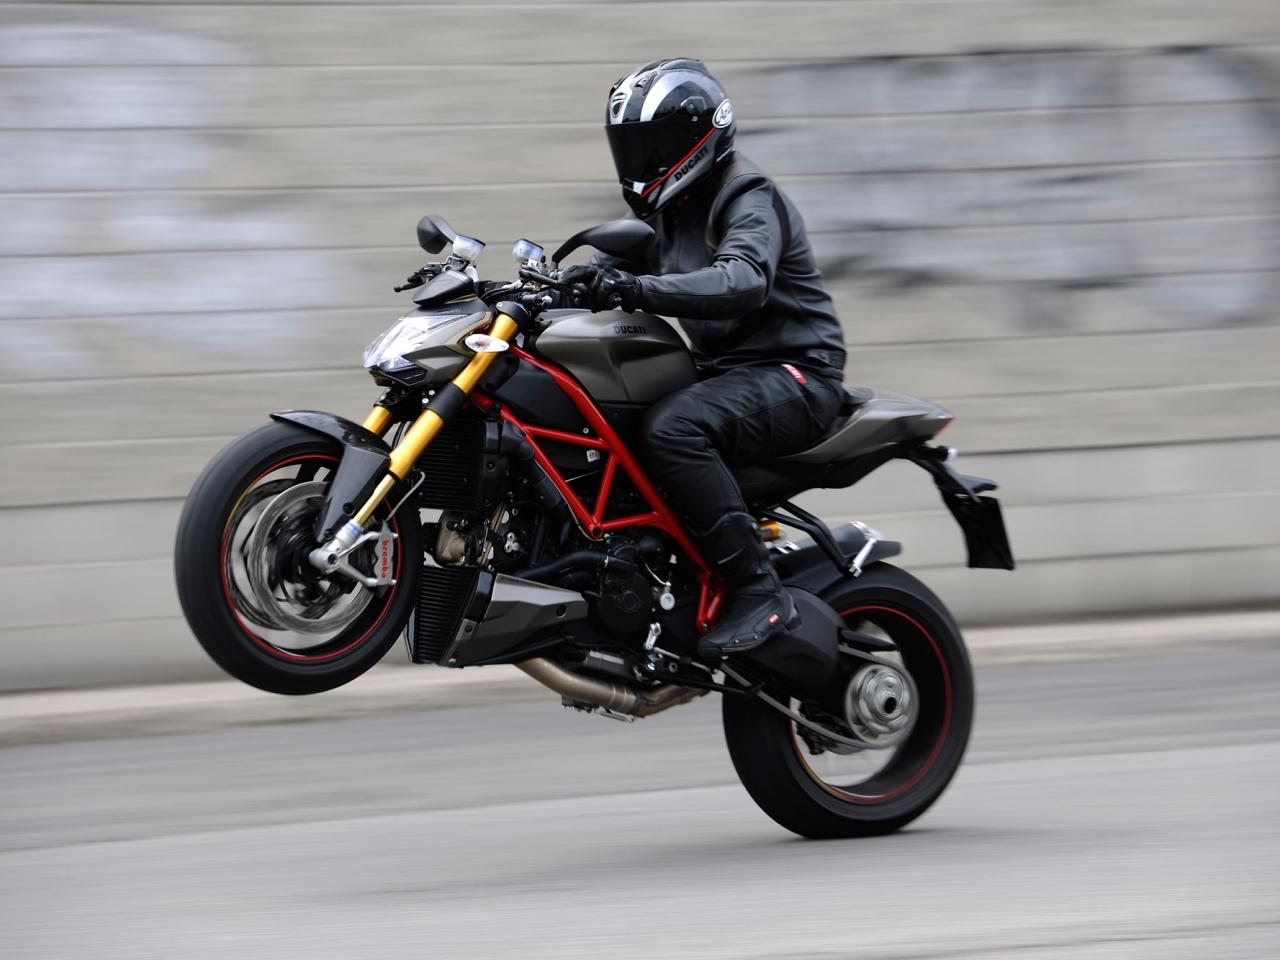 Caballito en Ducati - 1280x960